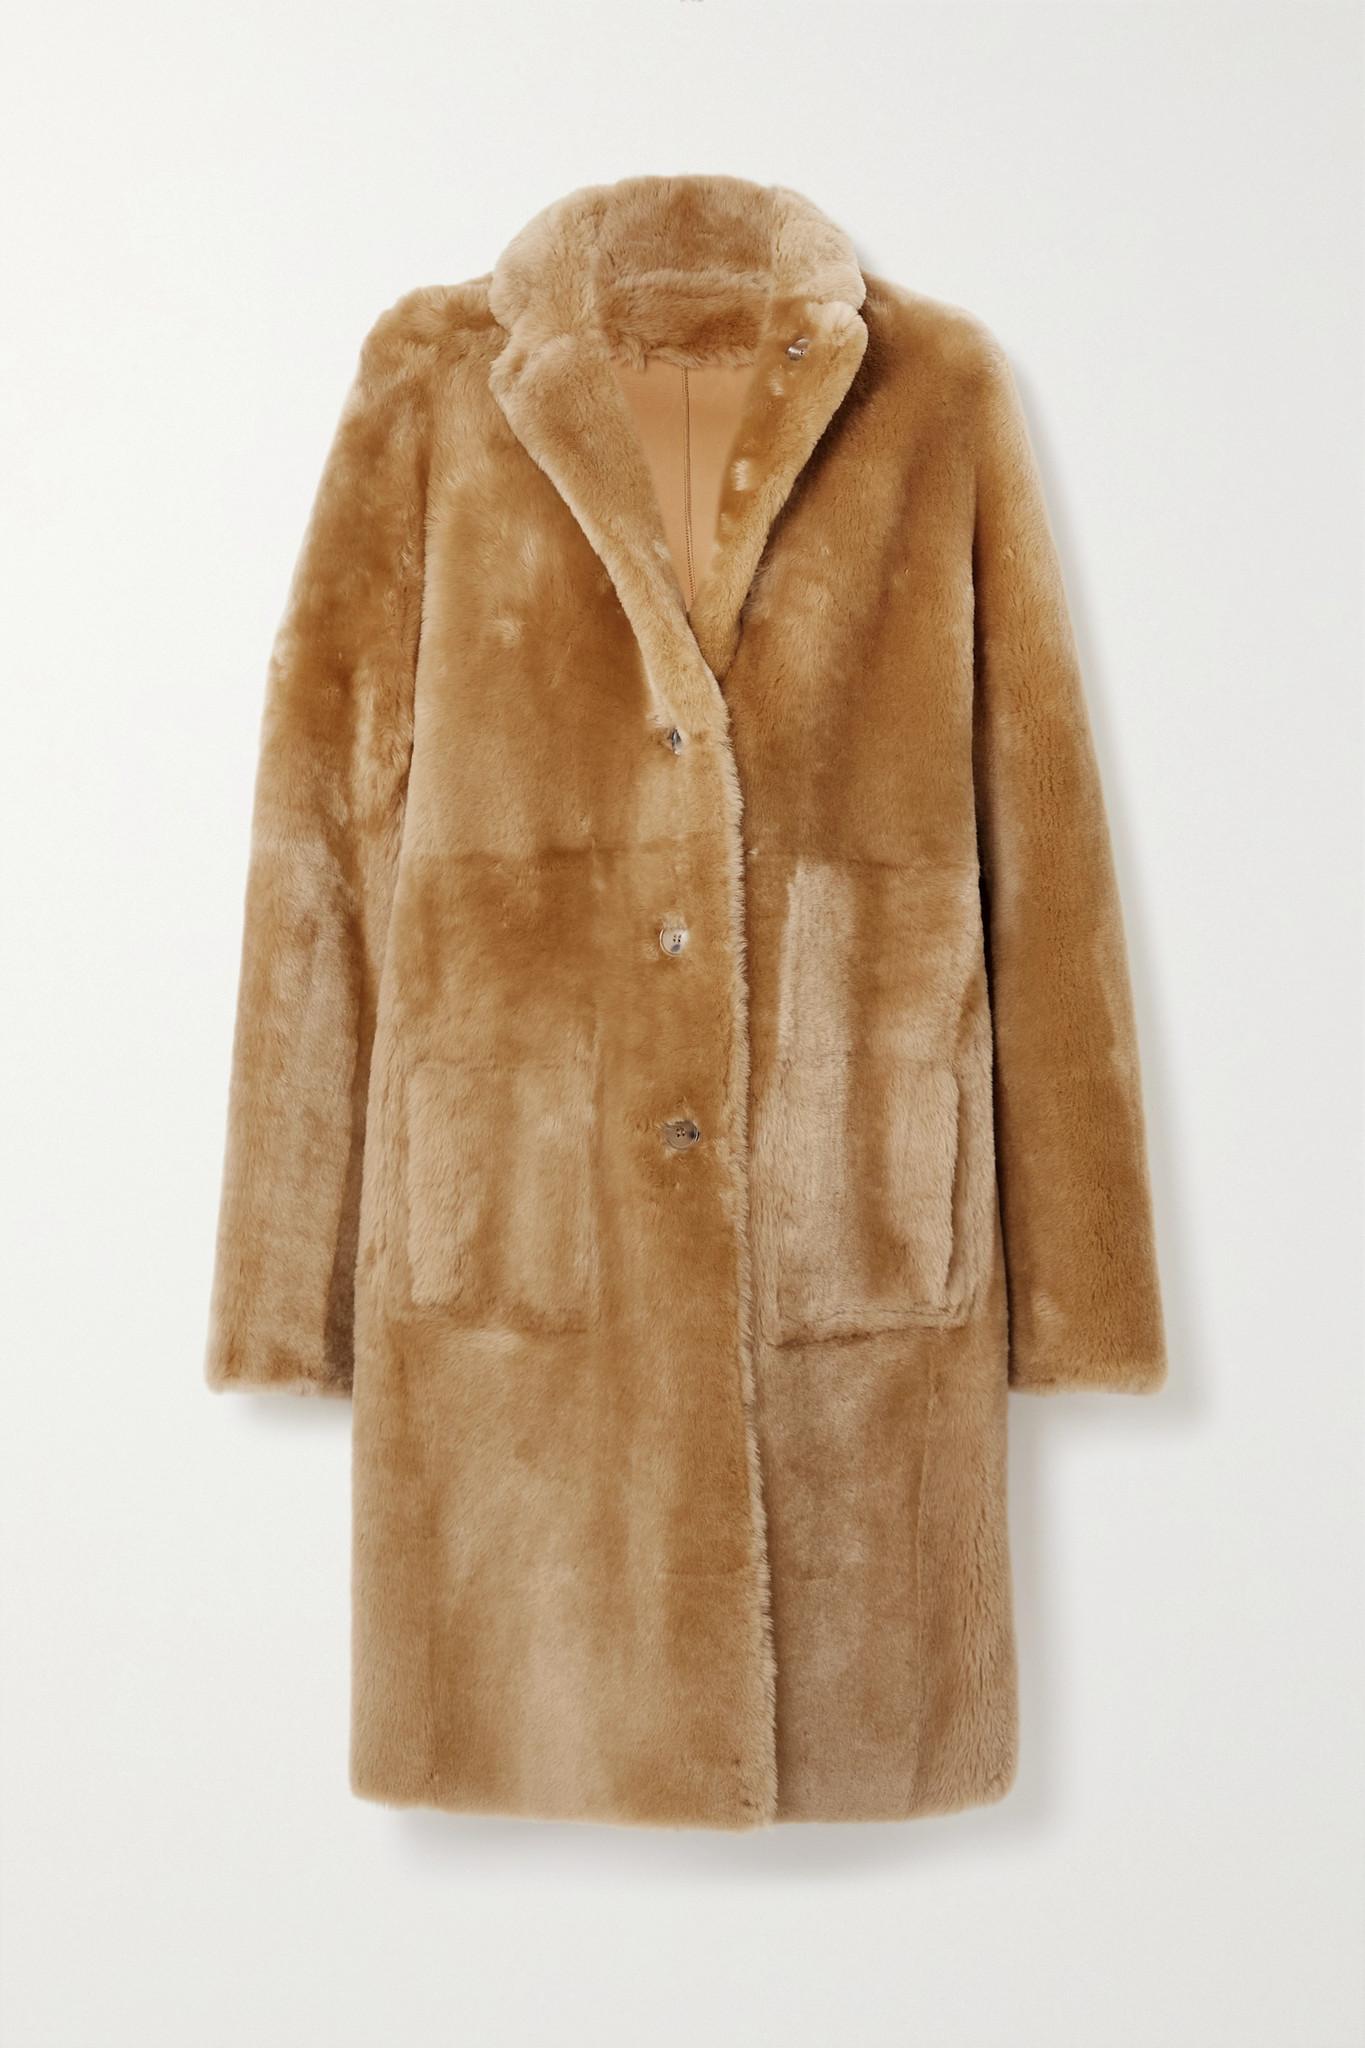 JOSEPH - Brittany 正反两穿羊毛皮外套 - 棕色 - FR38